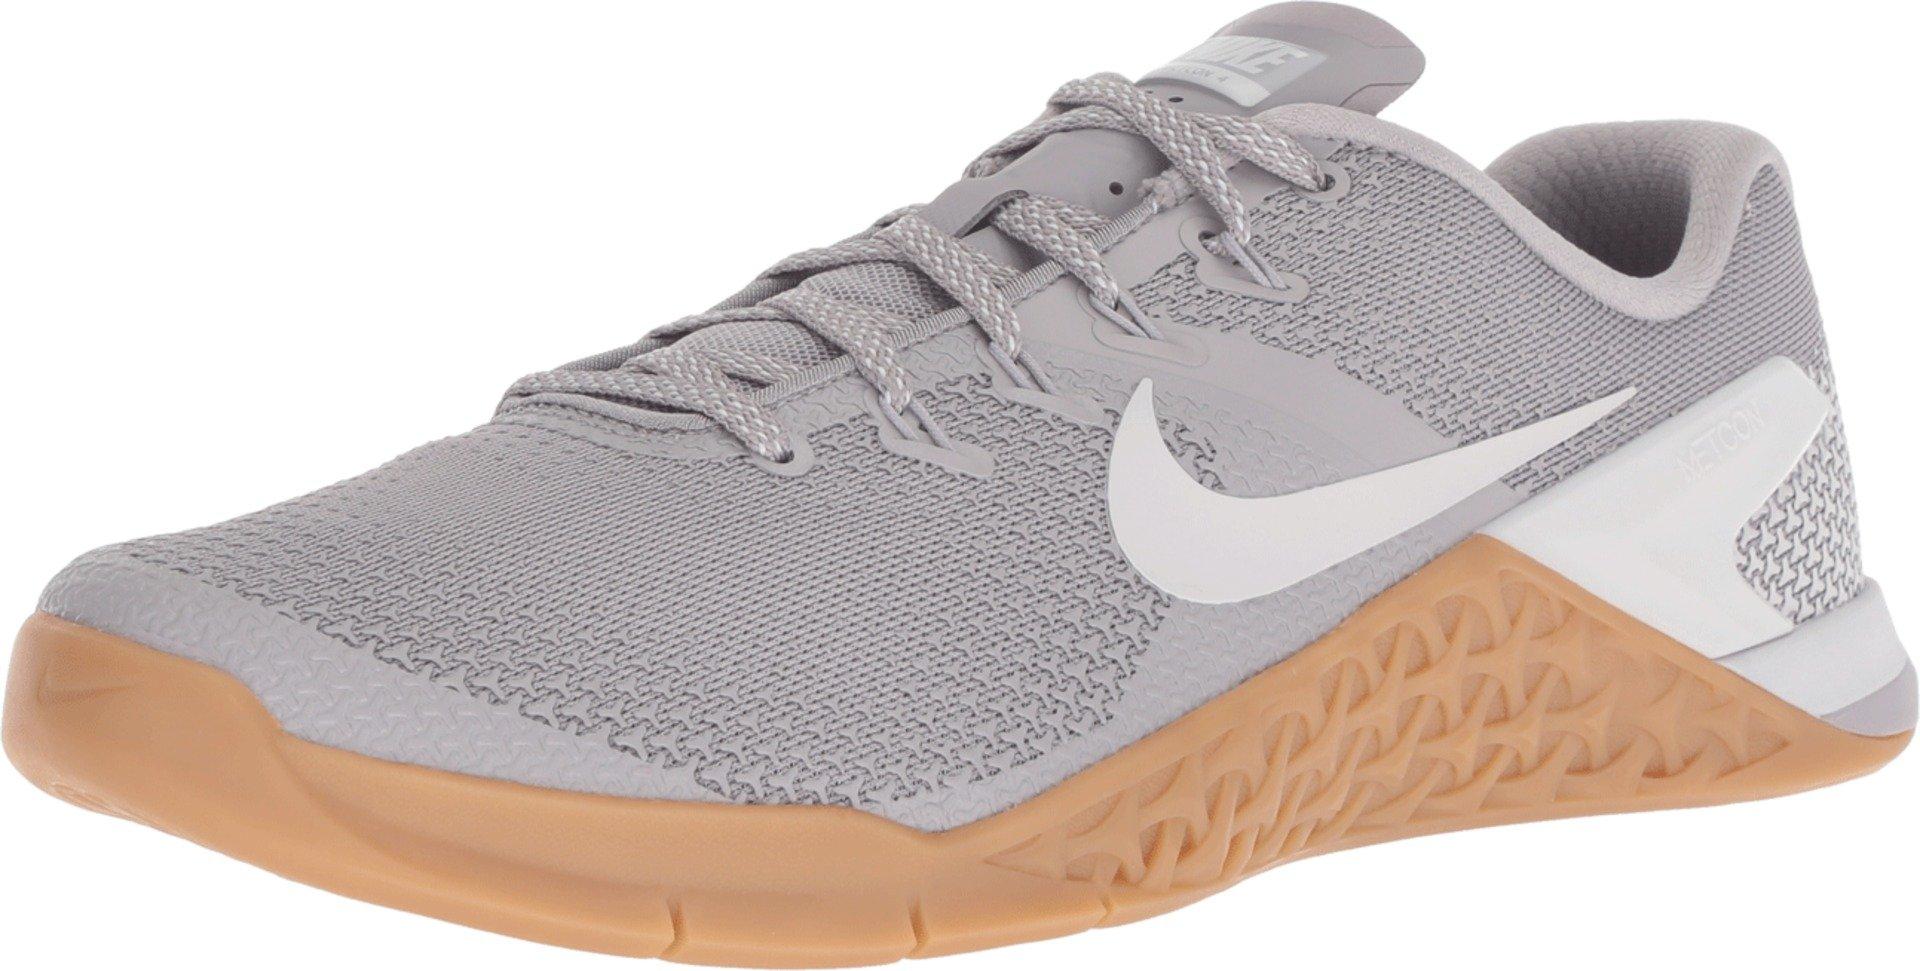 Nike Men's Metcon 4 Training Shoes (7.5, Grey/Brown)